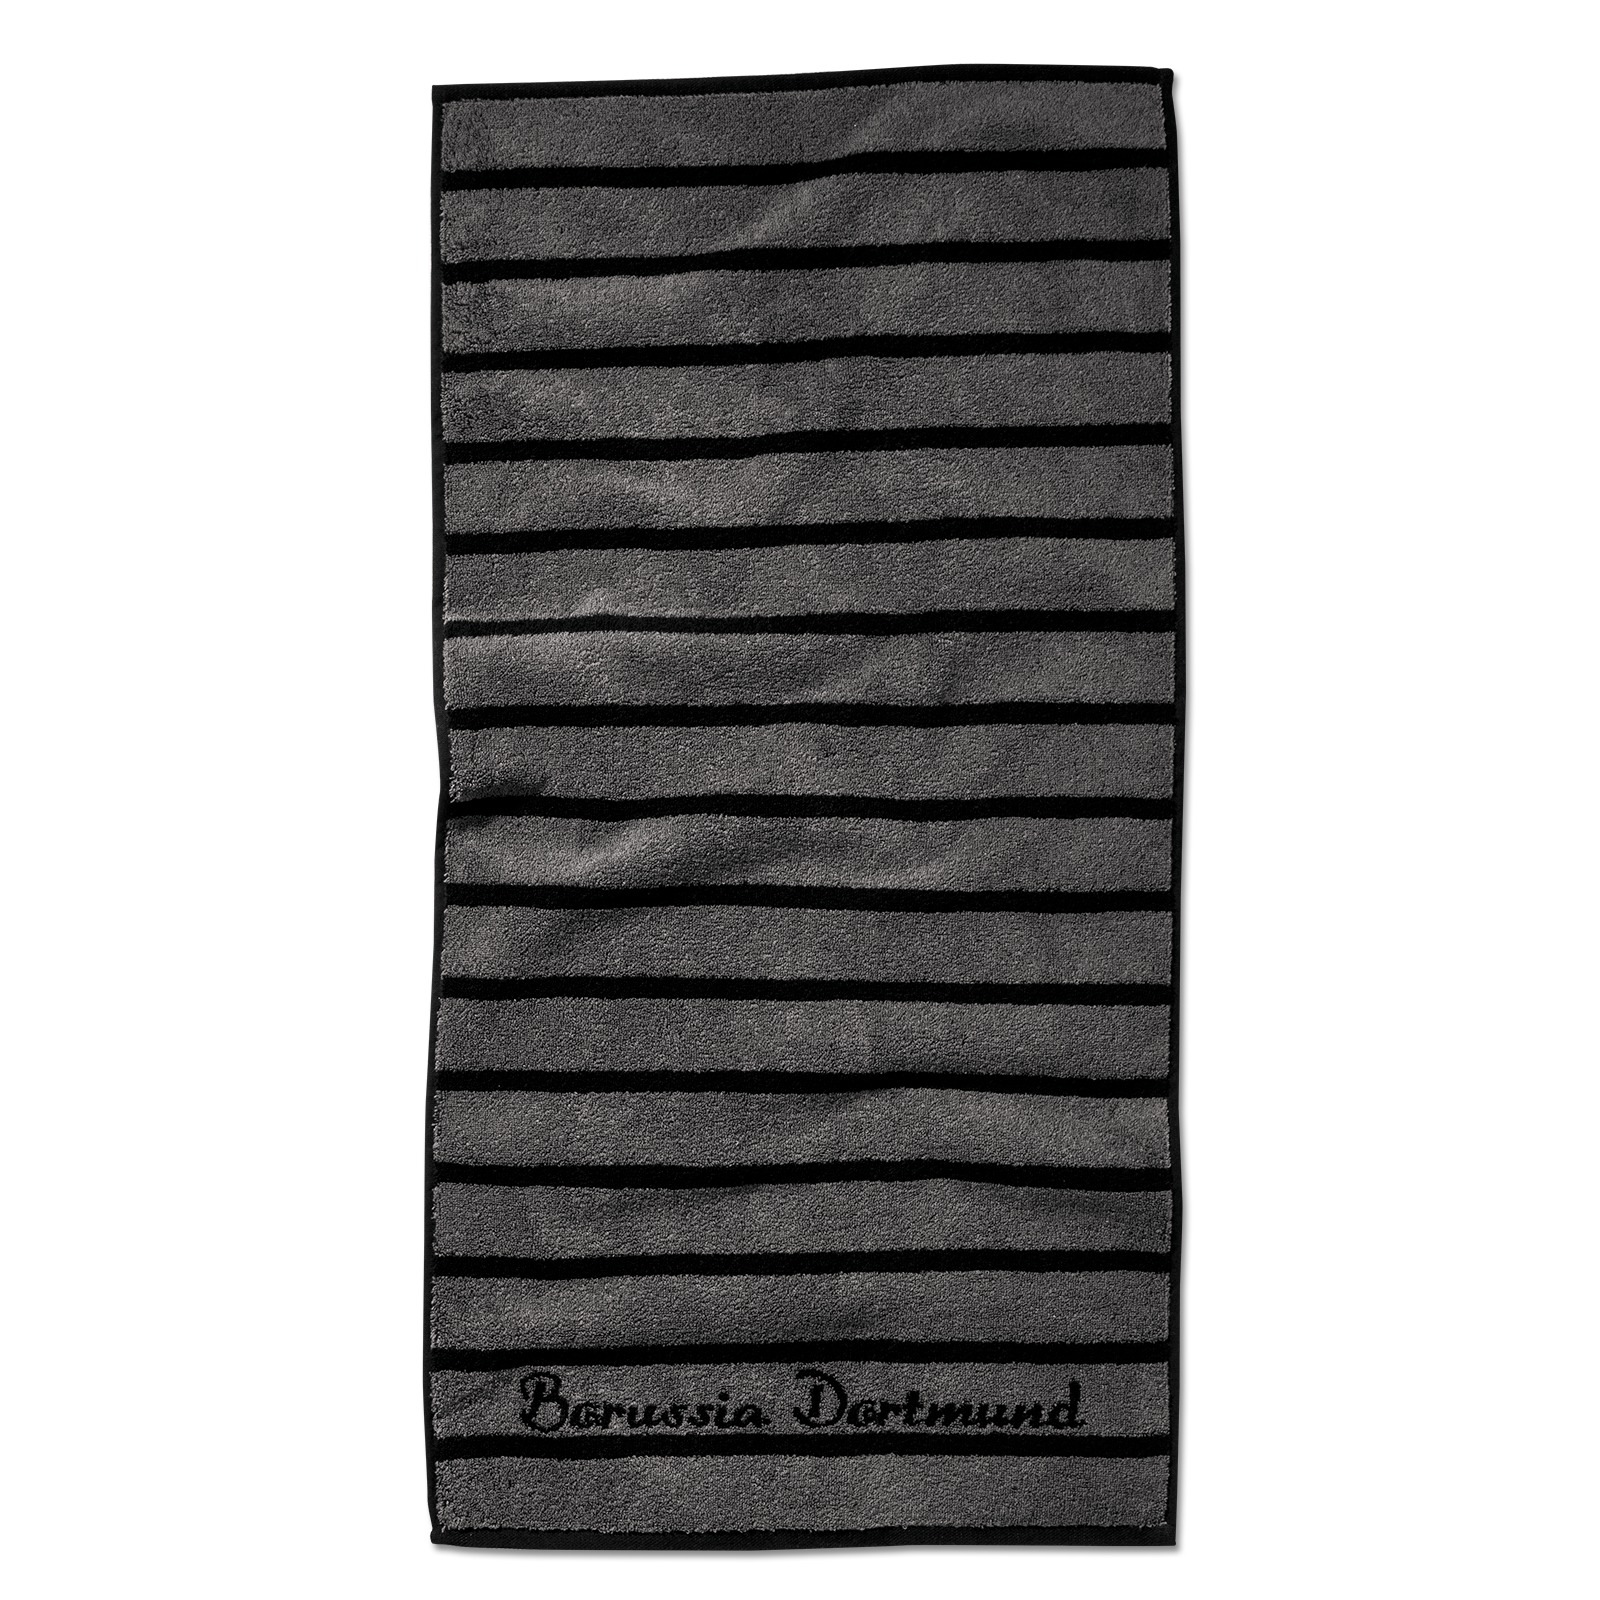 bvb handtuch schwarzgrau bad zu hause offizieller bvb online fanshop. Black Bedroom Furniture Sets. Home Design Ideas